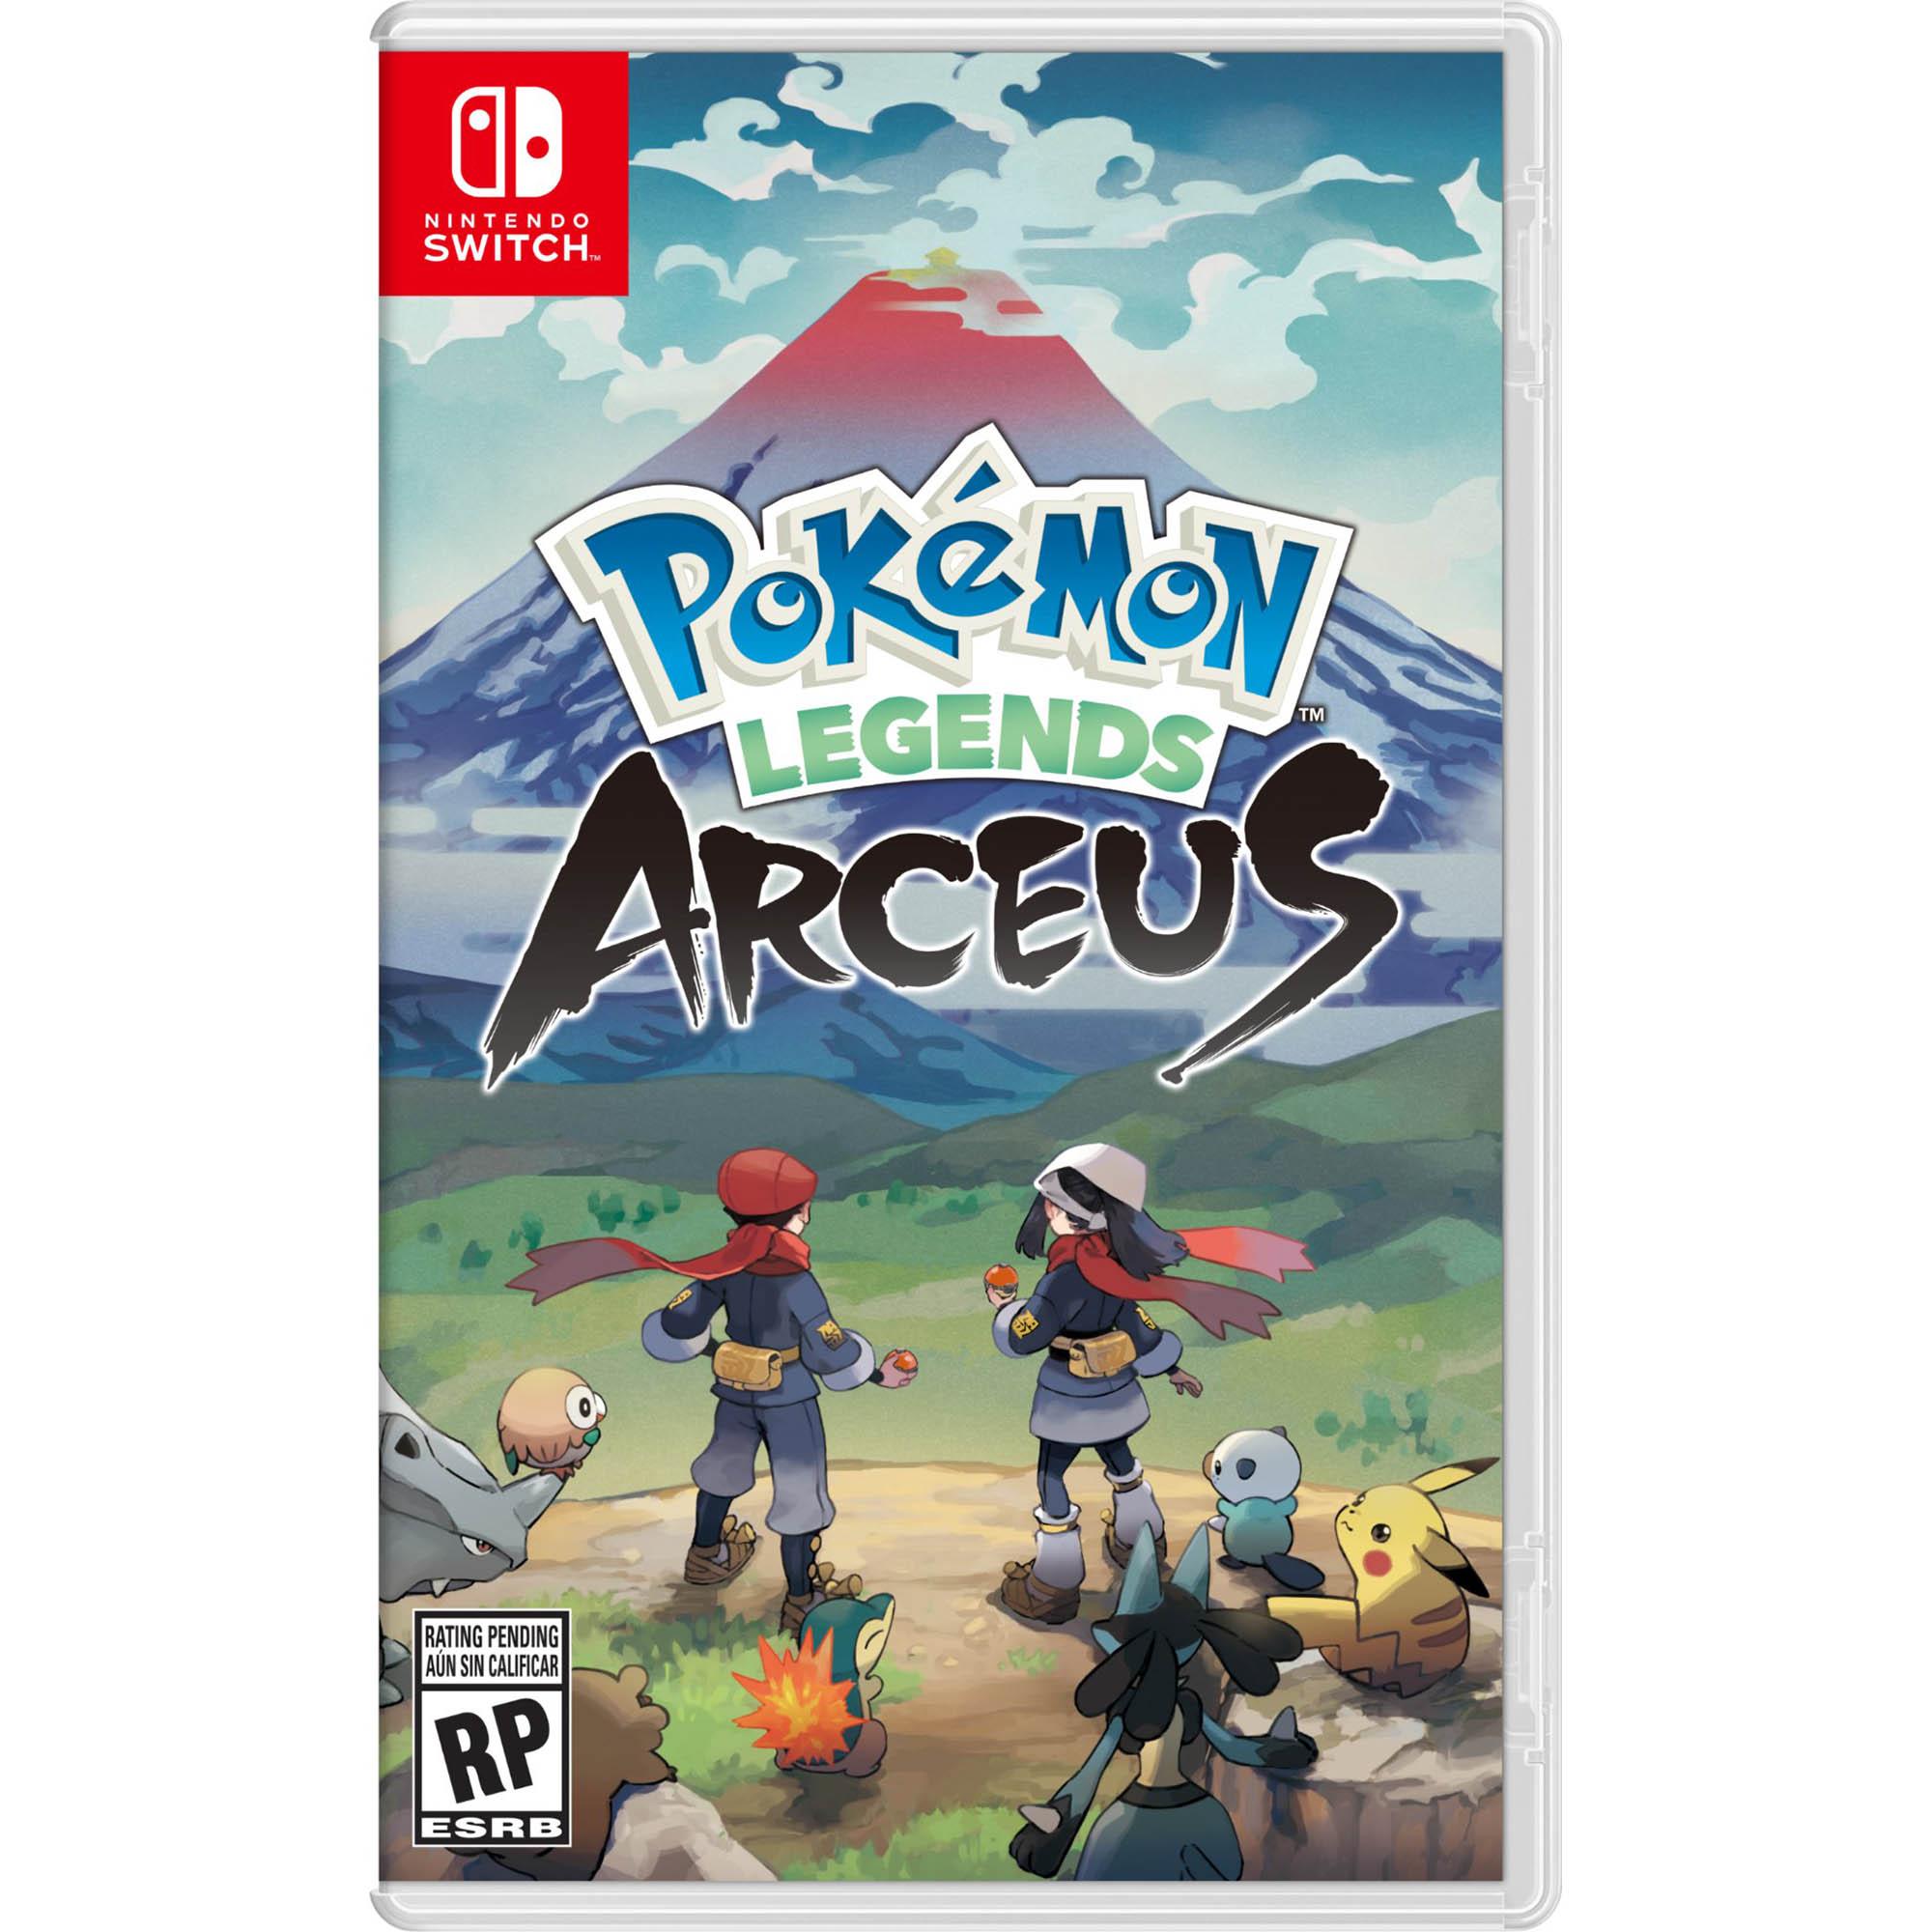 Pokémon: Legends Arceus - Nintendo Switch - Pré Venda - Mídia Física